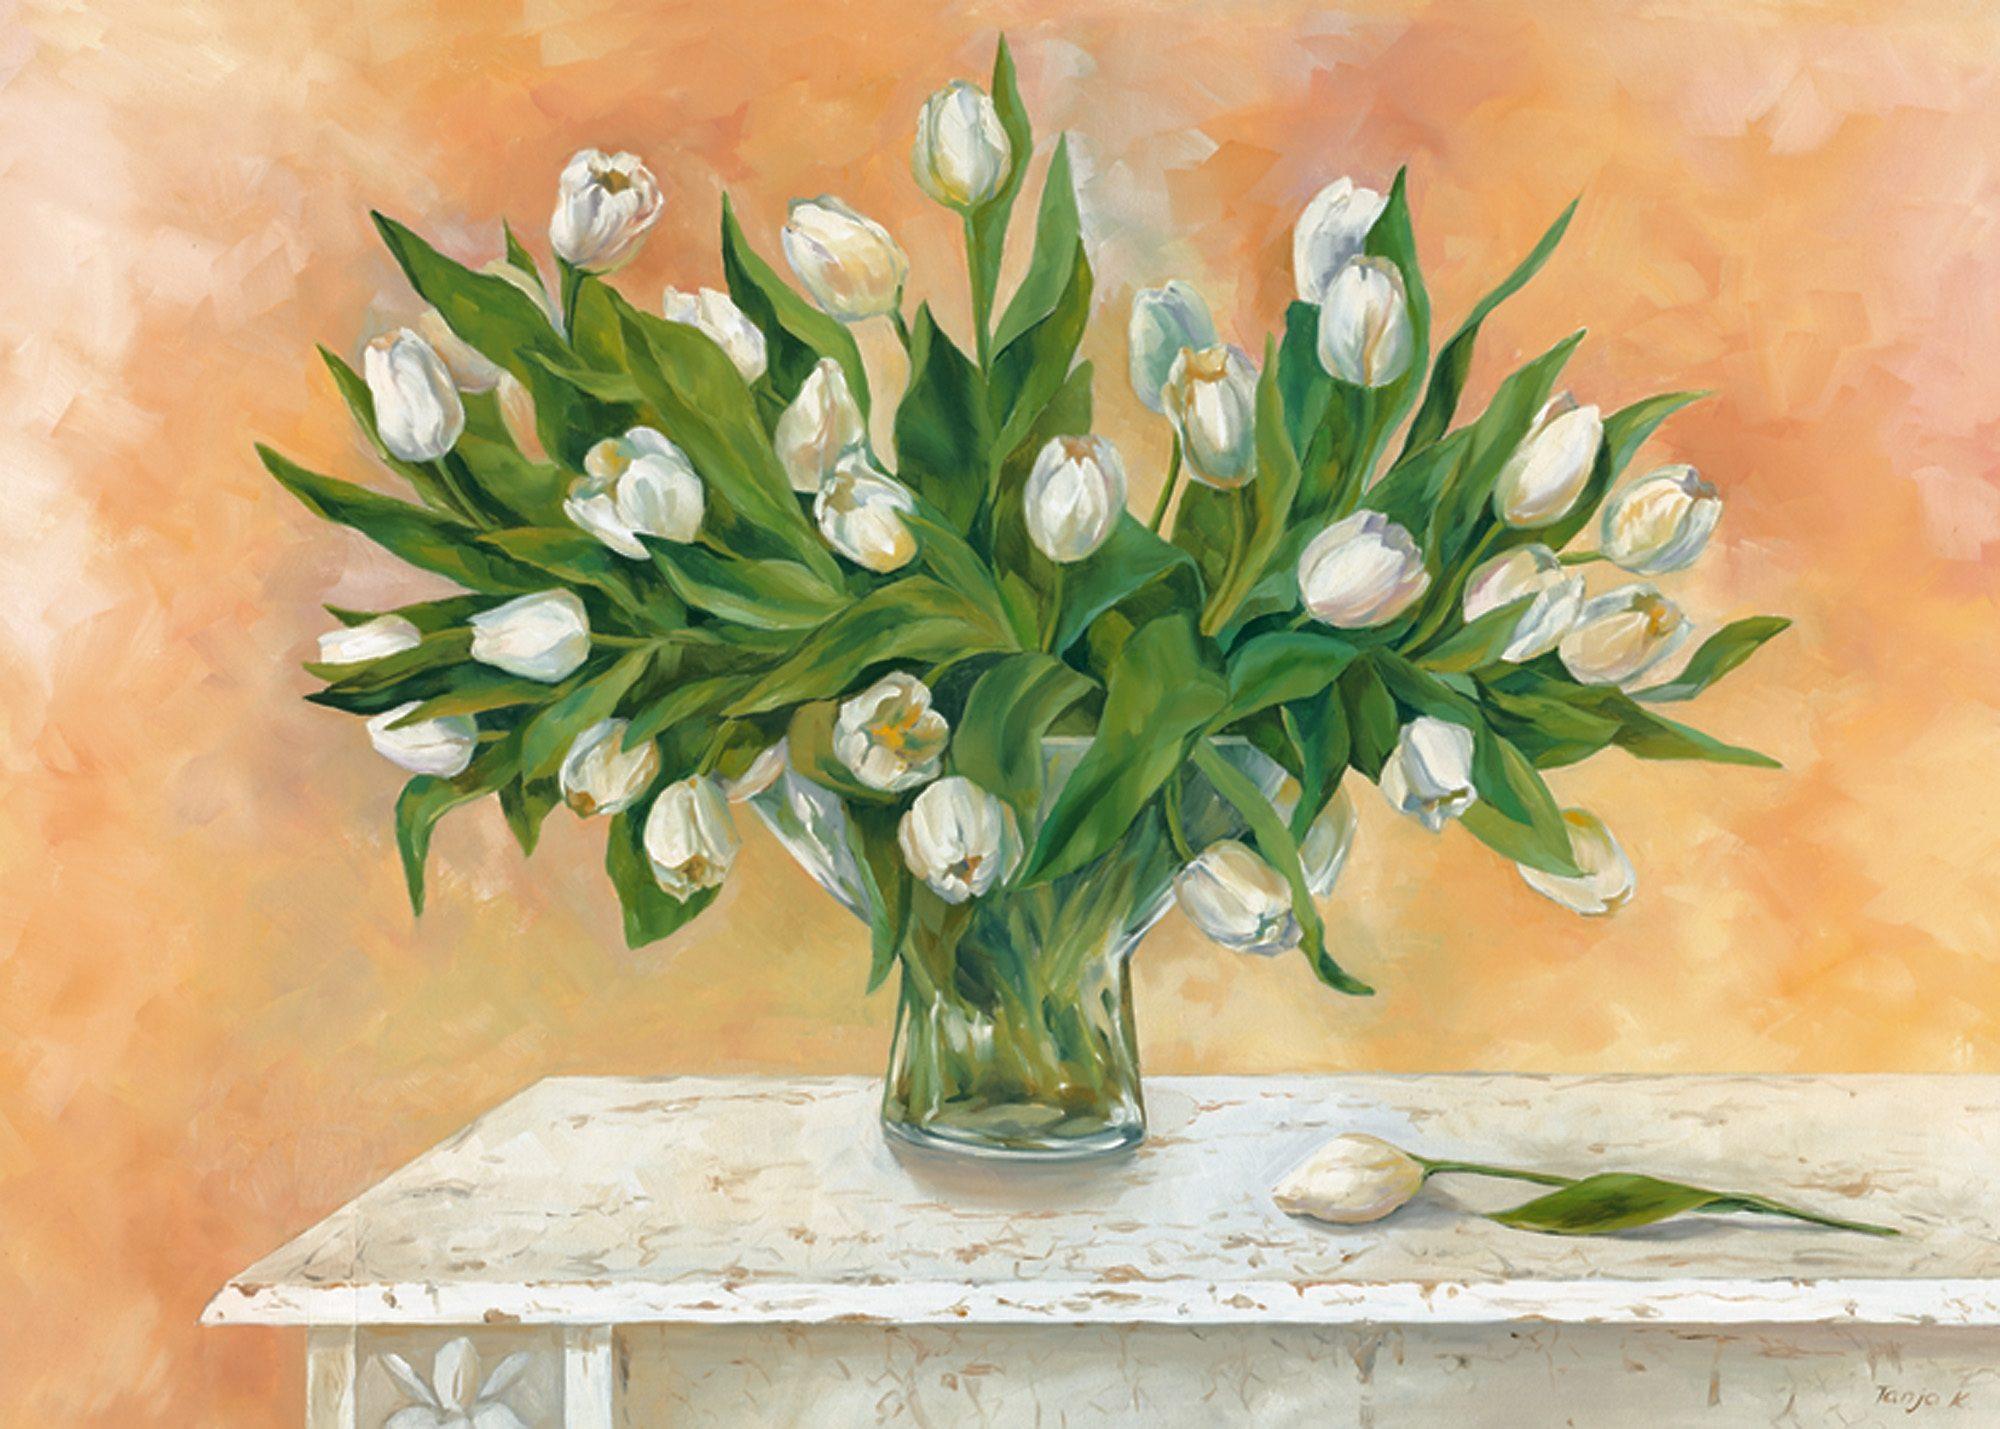 Bild, Kunstdruck, Home affaire, »Tanja Kowak: Weiße Tulpen II«, 69/49 cm